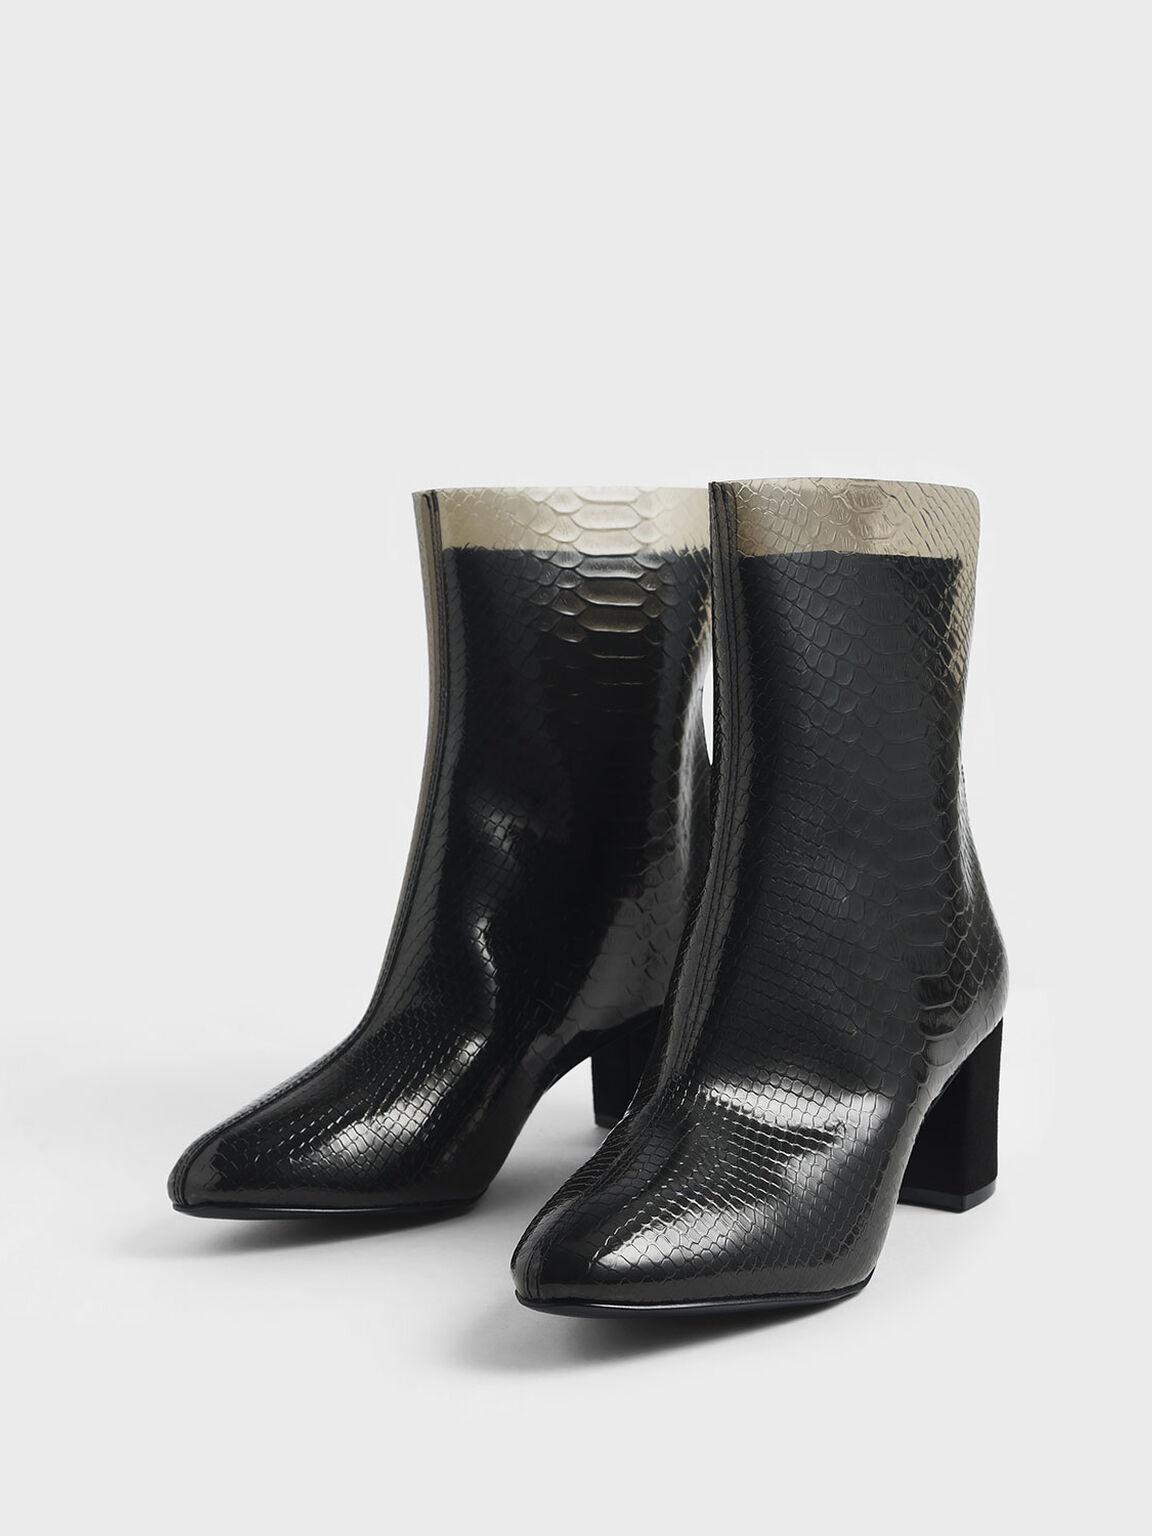 Snake Print See-Through Effect Block Heel Calf Boots, Black, hi-res